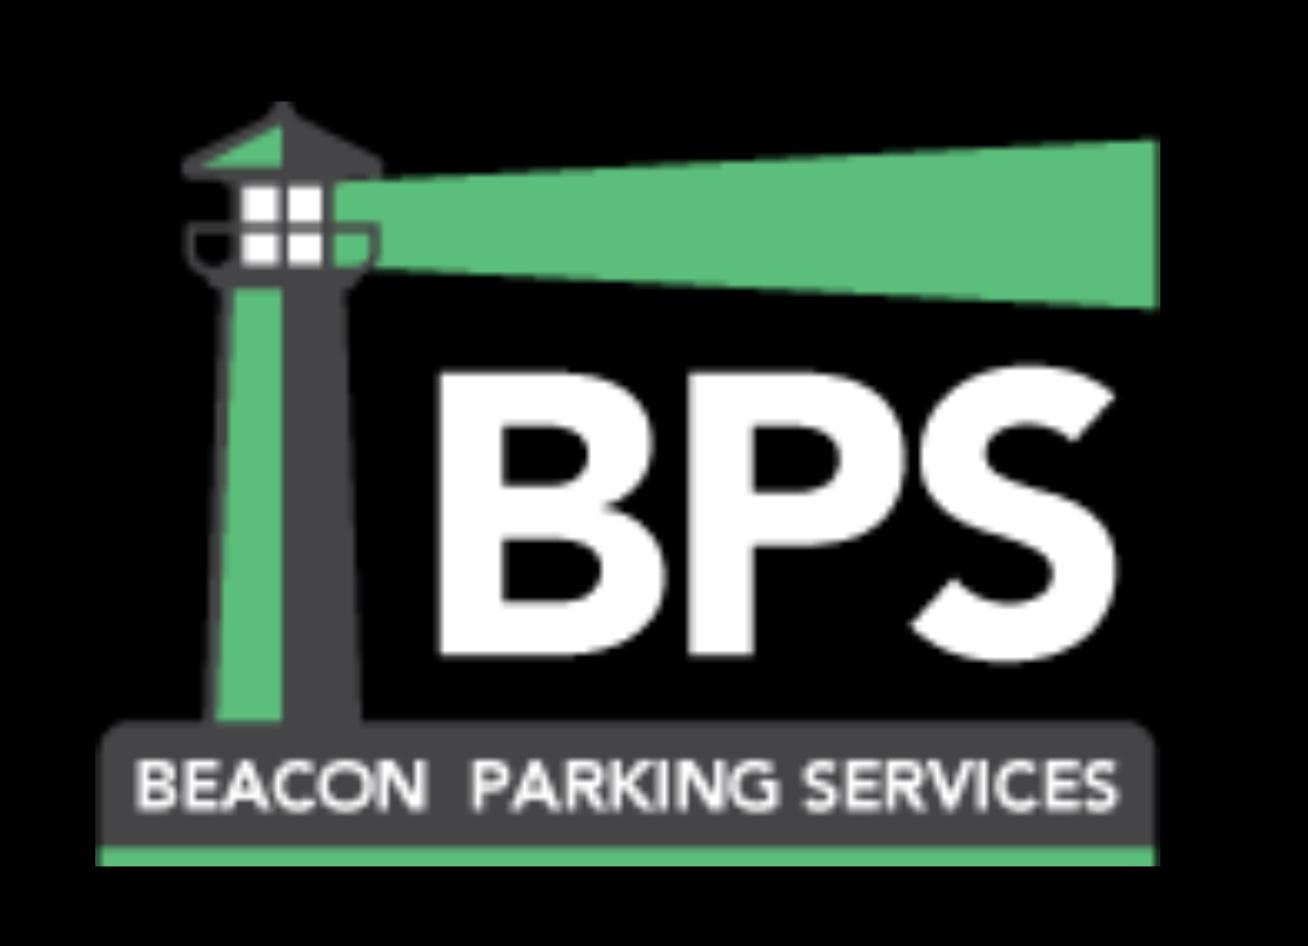 Beacon Parking Services